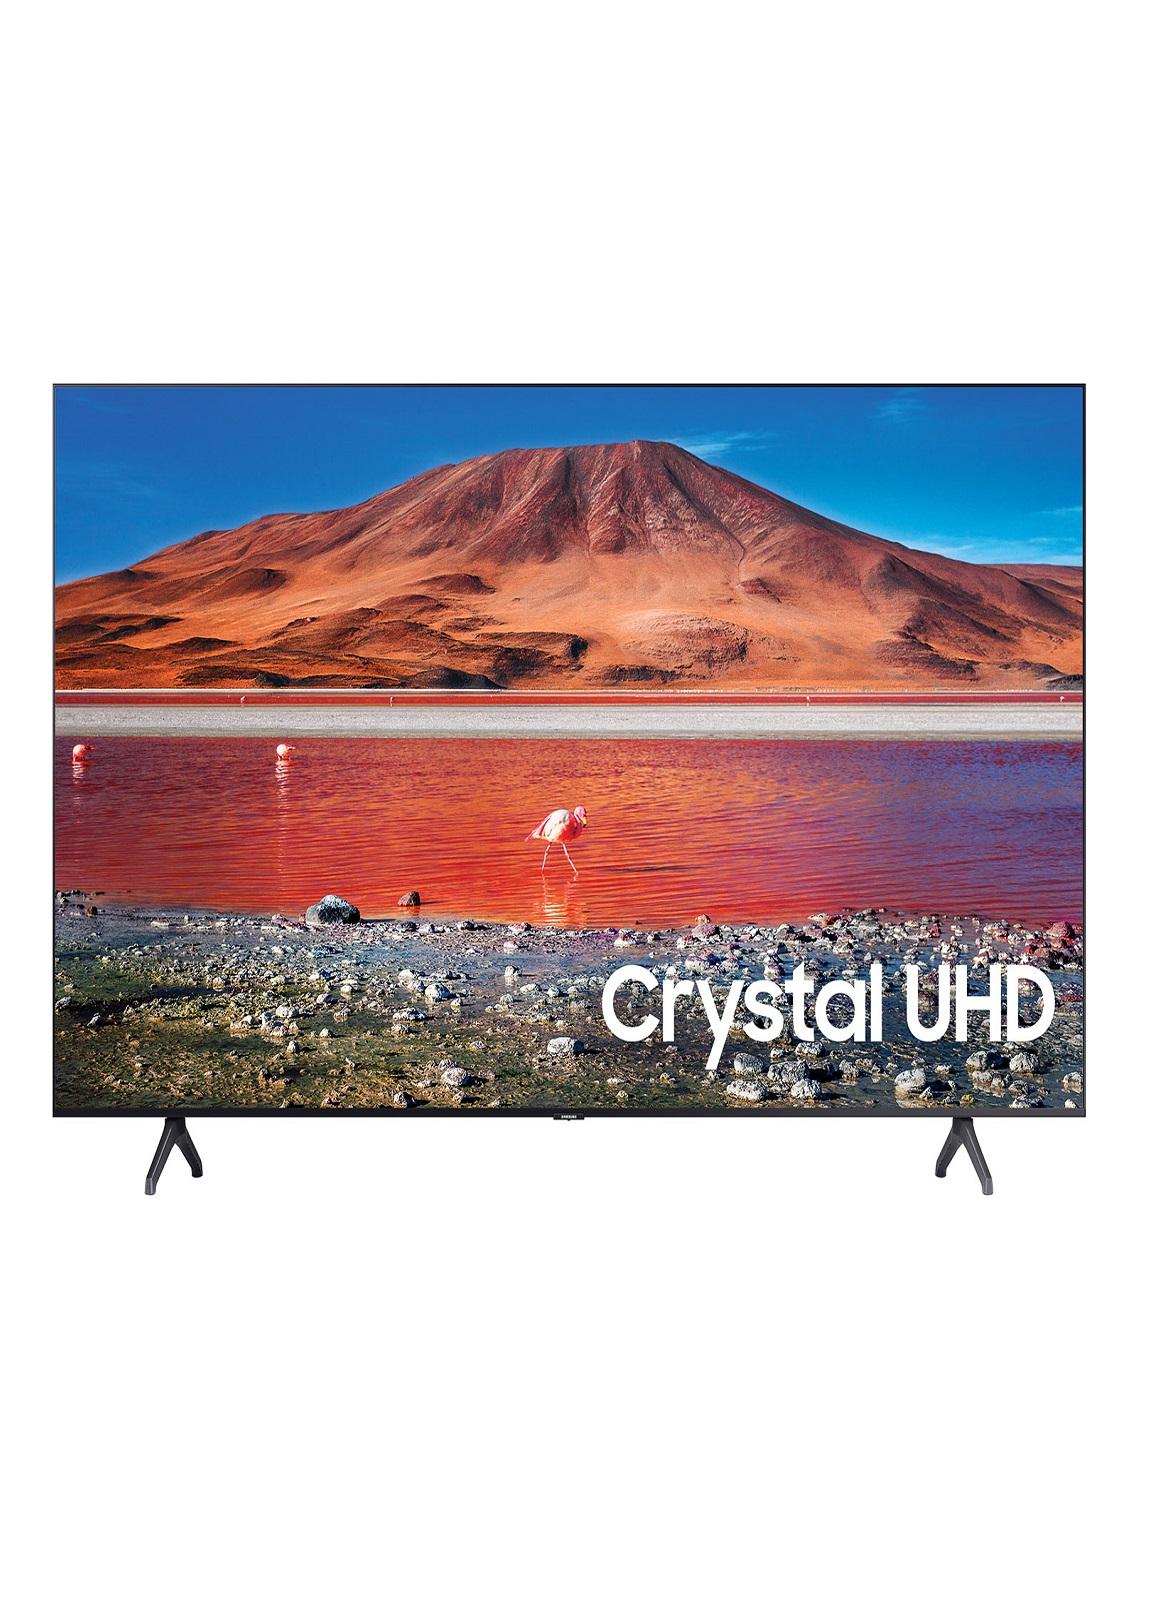 Samsung TU7000 Crystal UHD 4K Smart TV 65 شاشة تلفاز